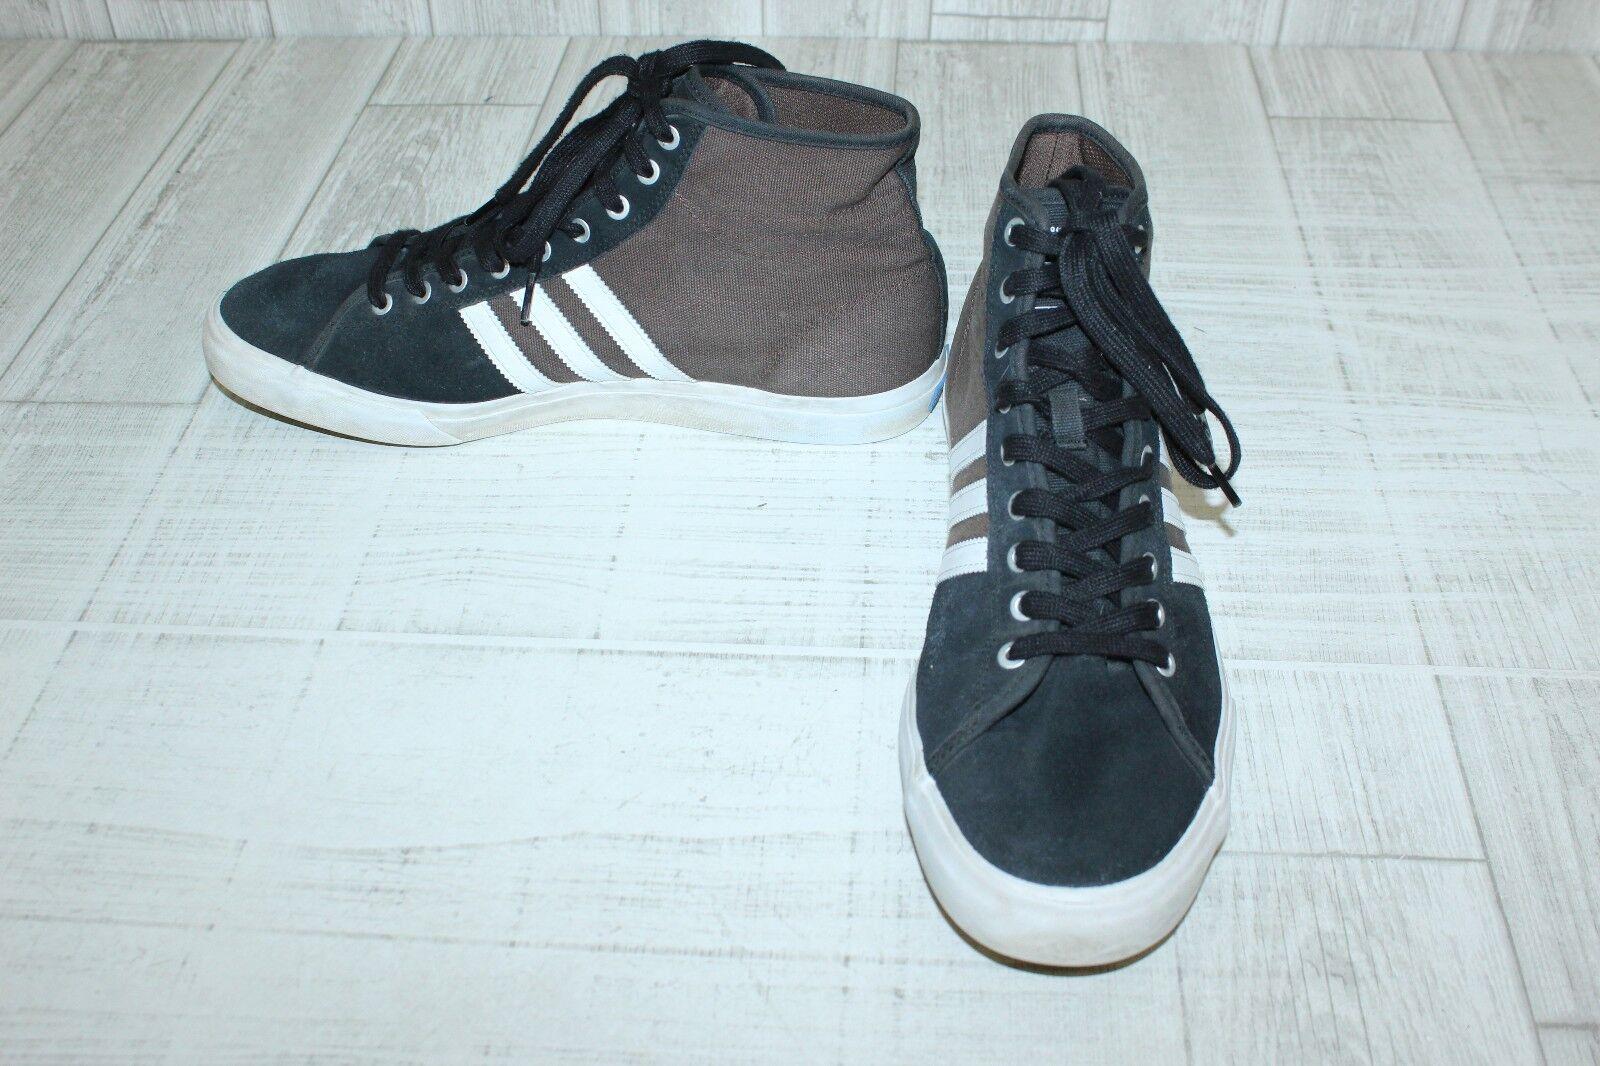 adidas Matchcourt High Rx Hi Top Skateboarding Shoes-Men's size 14 Brown/Black Wild casual shoes